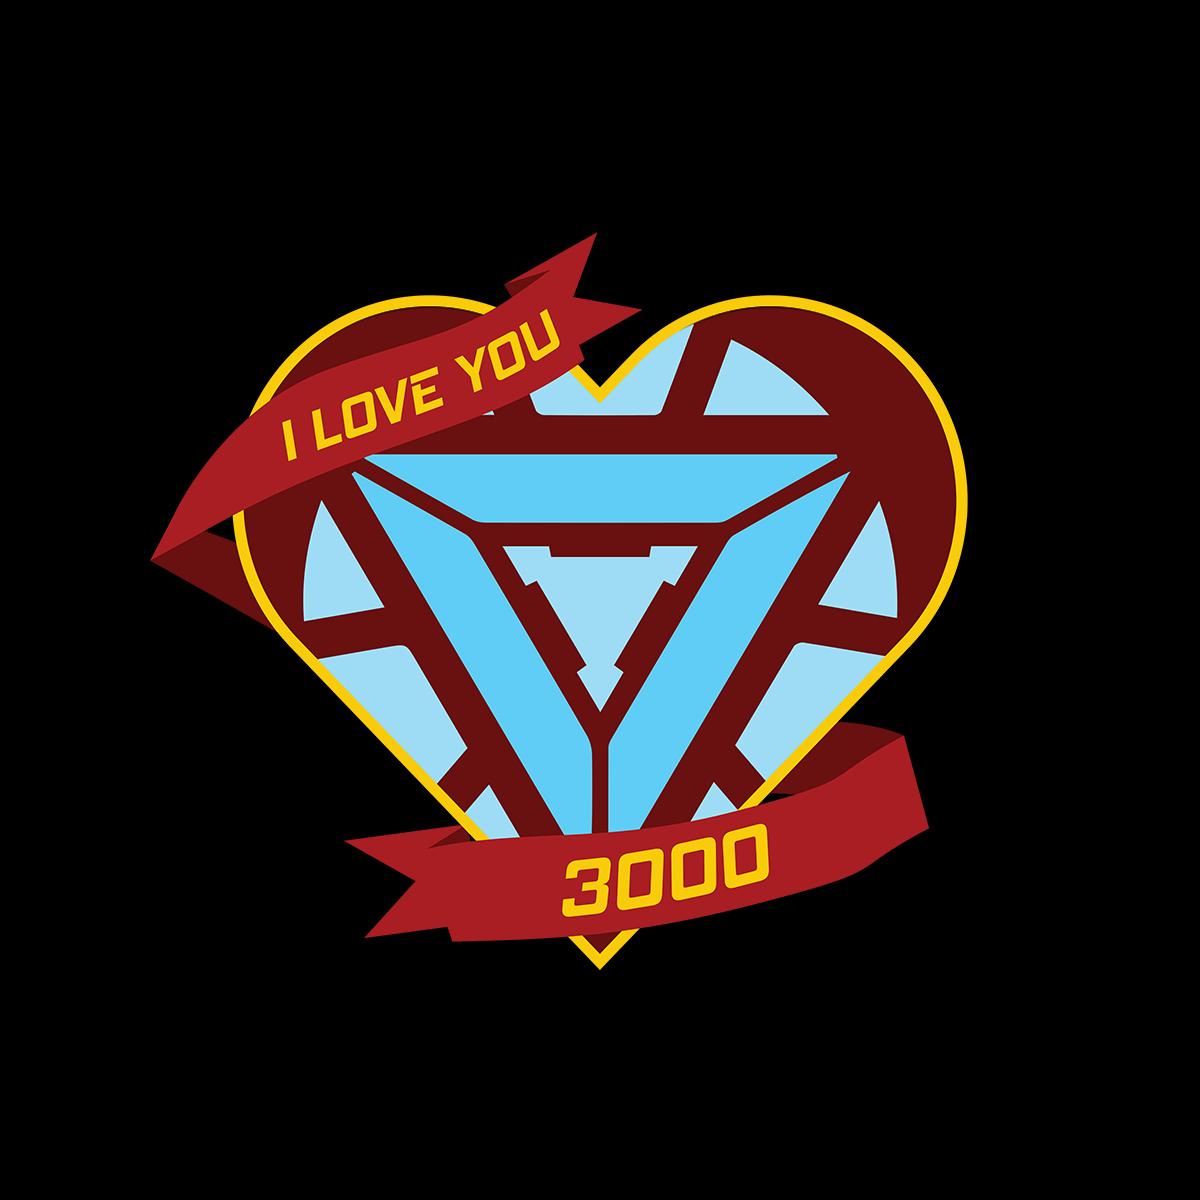 I Love You 3000 Avengers End Game Tony Stark I Love You My Love Love You